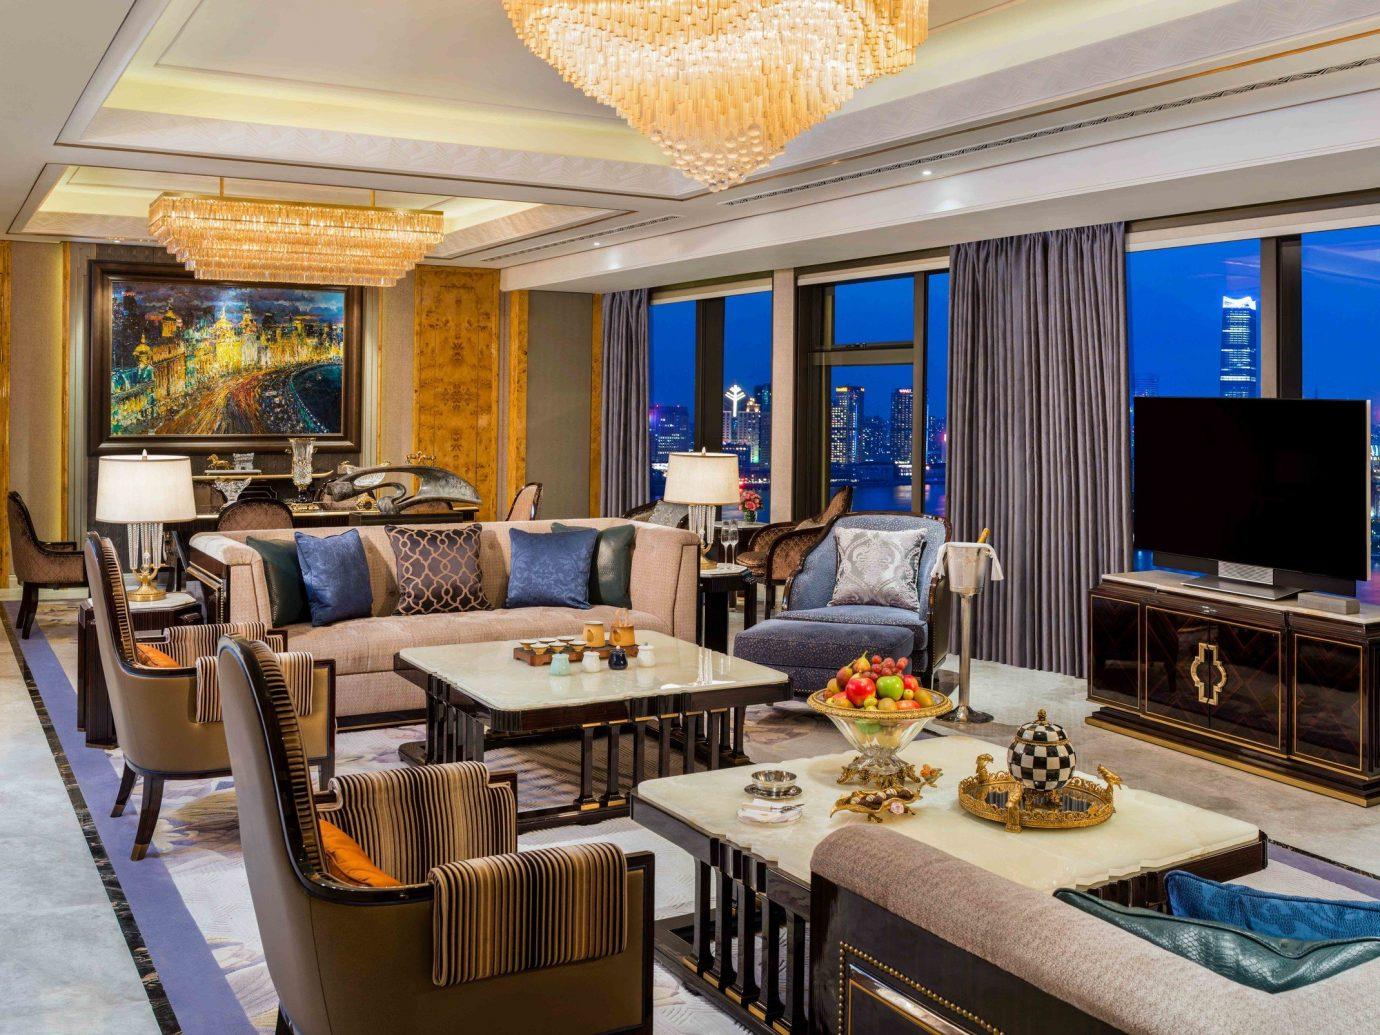 Boutique Hotels Luxury Travel indoor table floor ceiling window Living room living room interior design Suite real estate furniture penthouse apartment Lobby estate apartment area